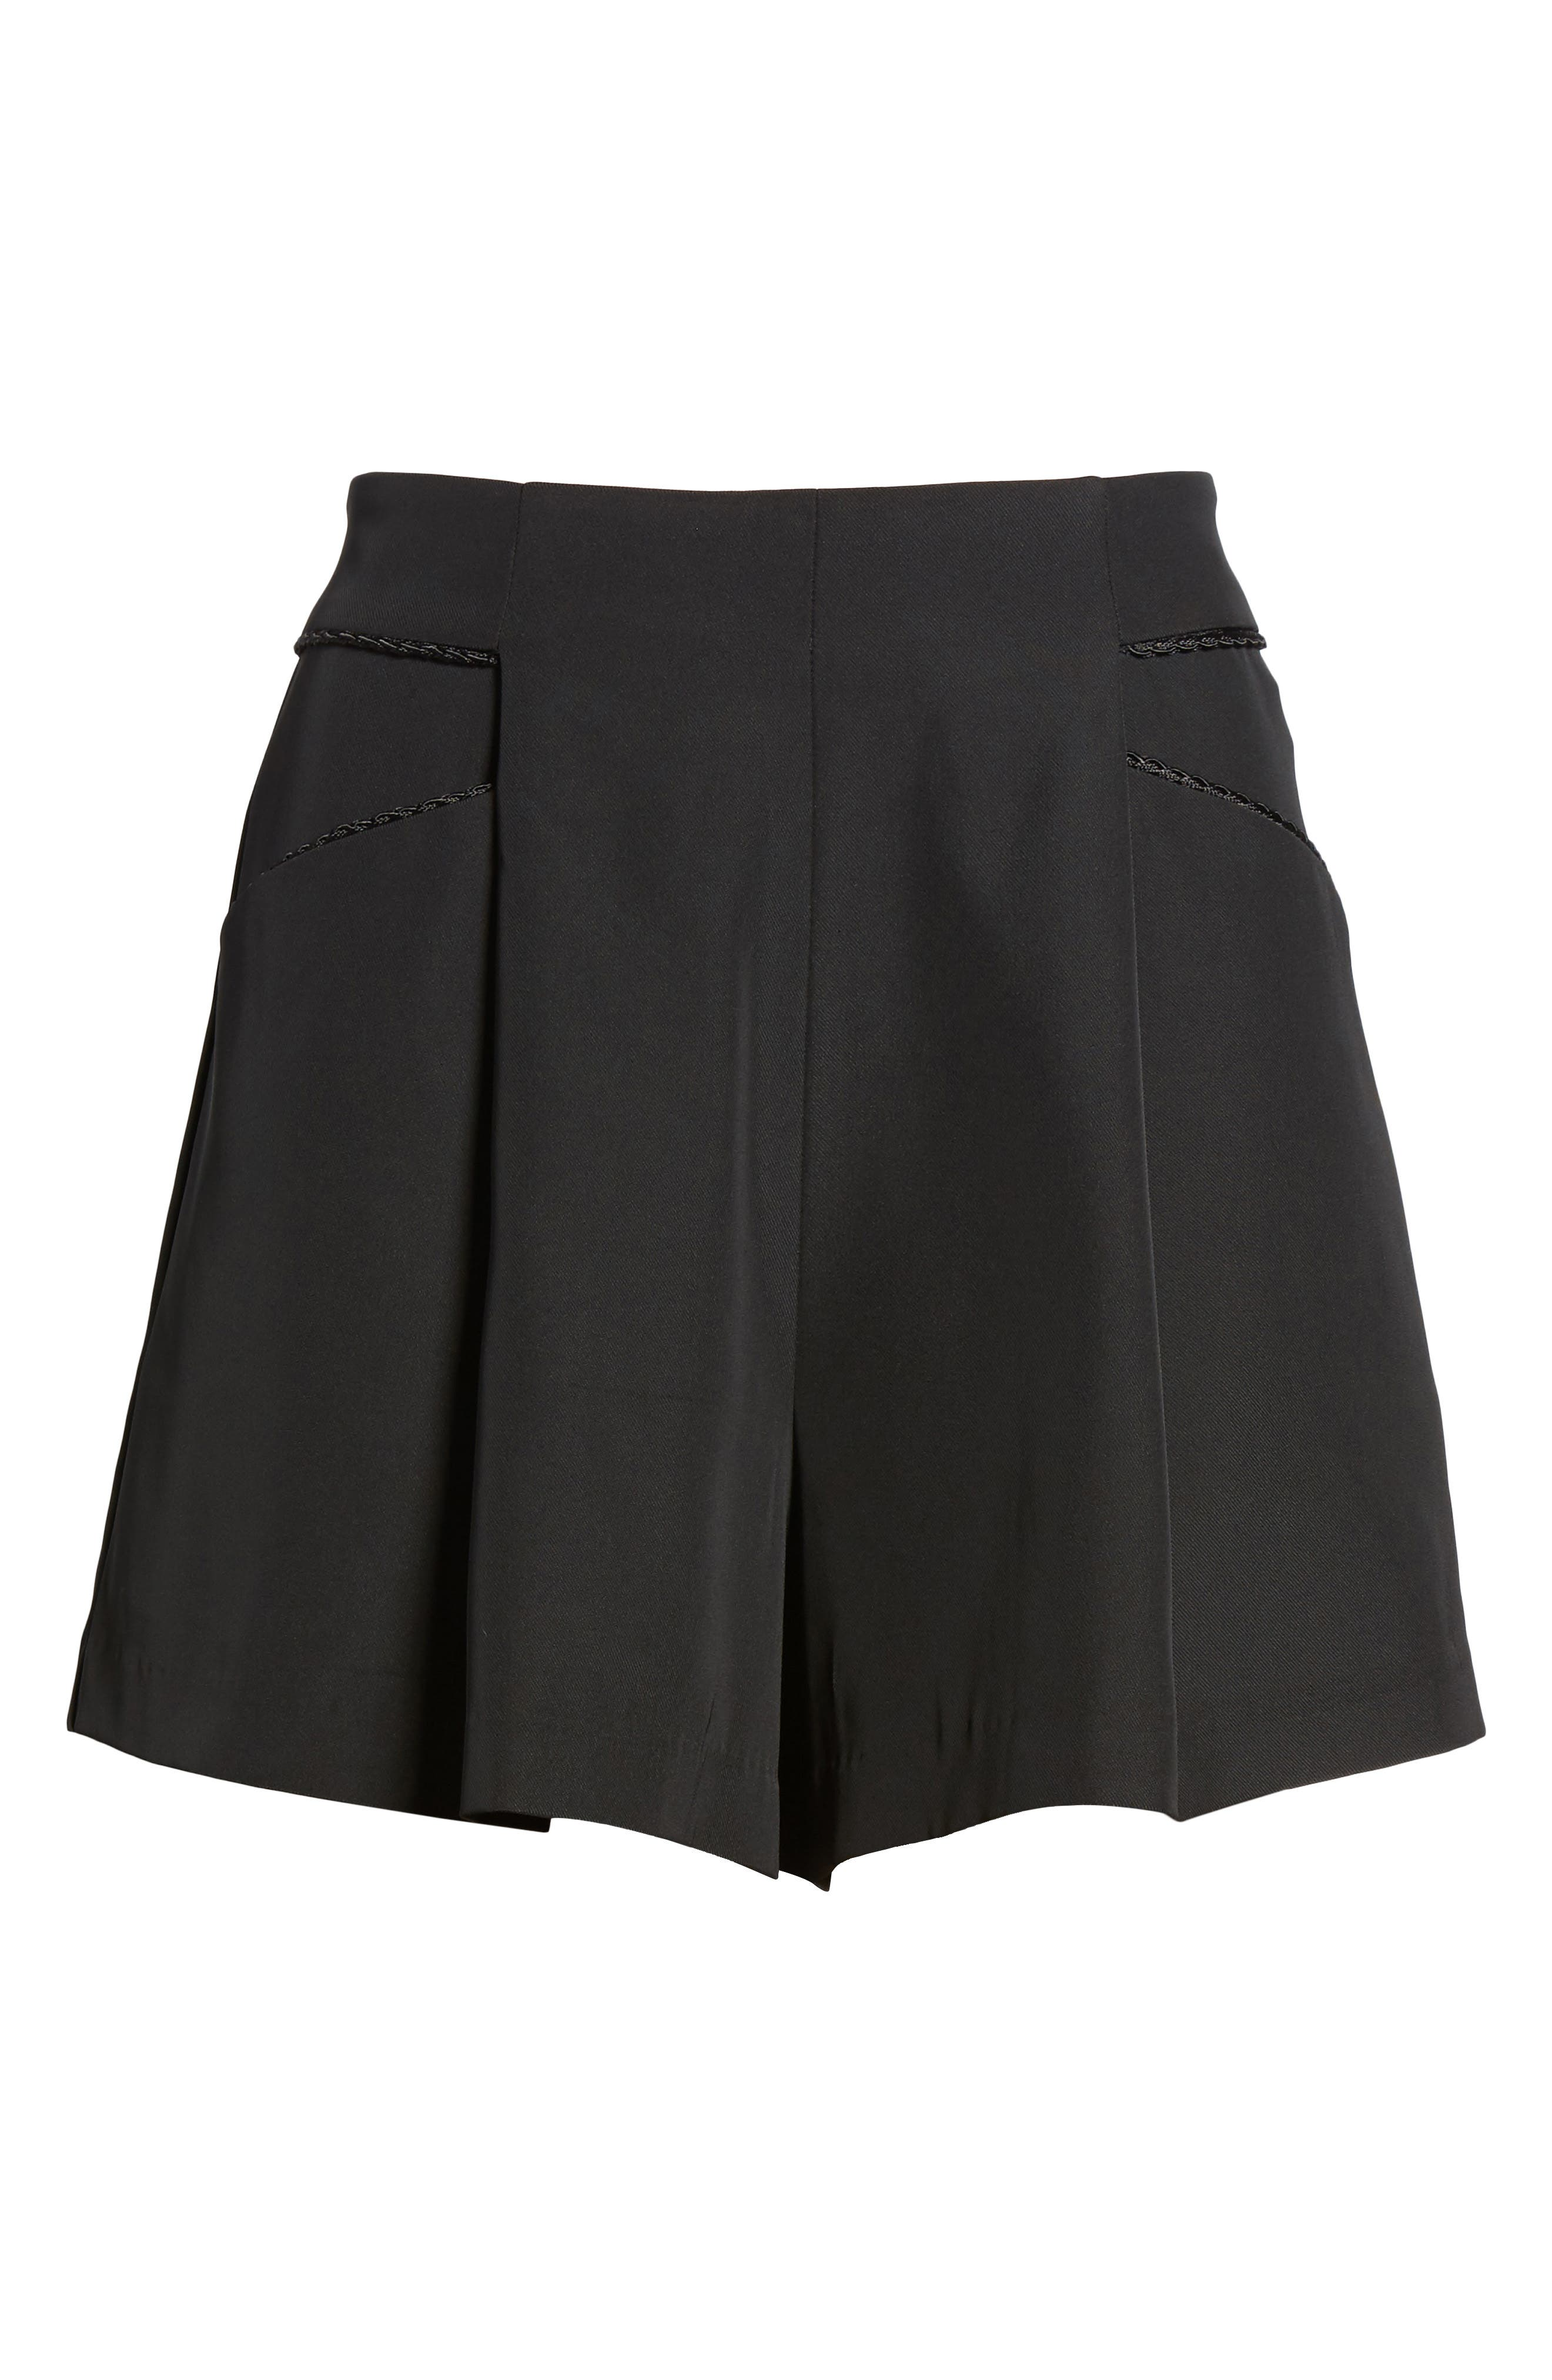 Ceremony High Waist Shorts,                             Alternate thumbnail 6, color,